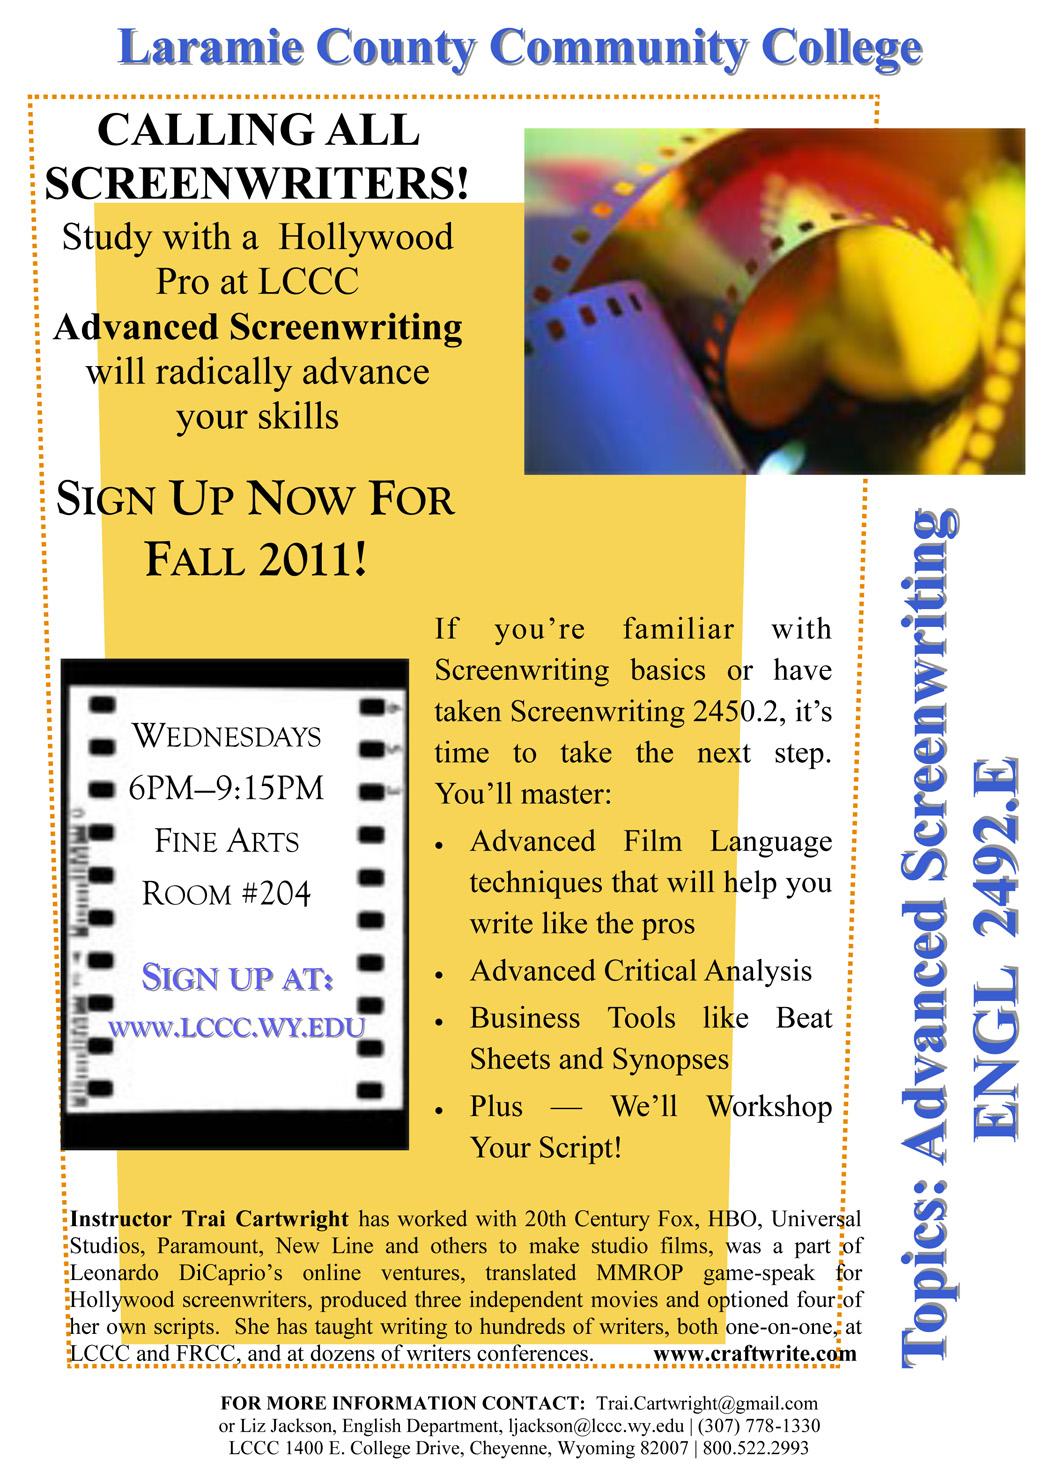 Trai Cartwright to teach advanced screenwriting class this